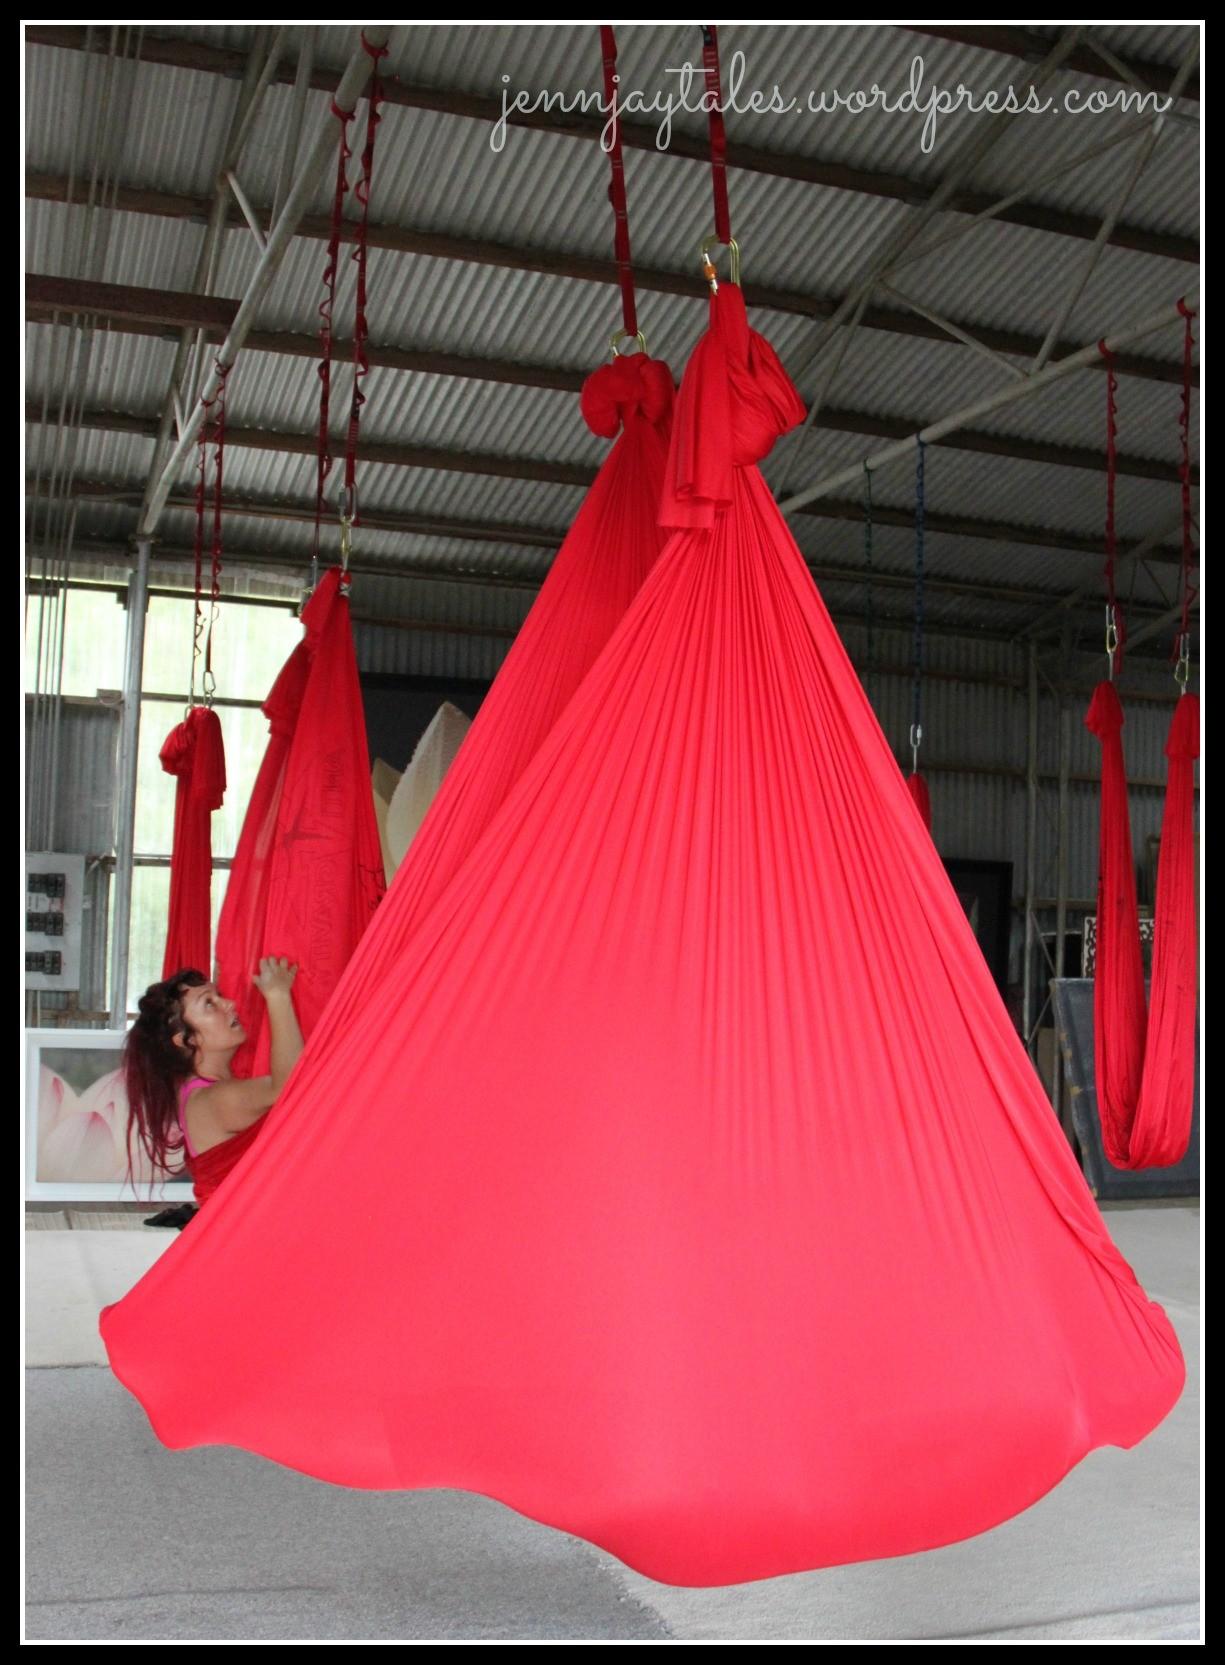 Cocooned anti gravity yoga